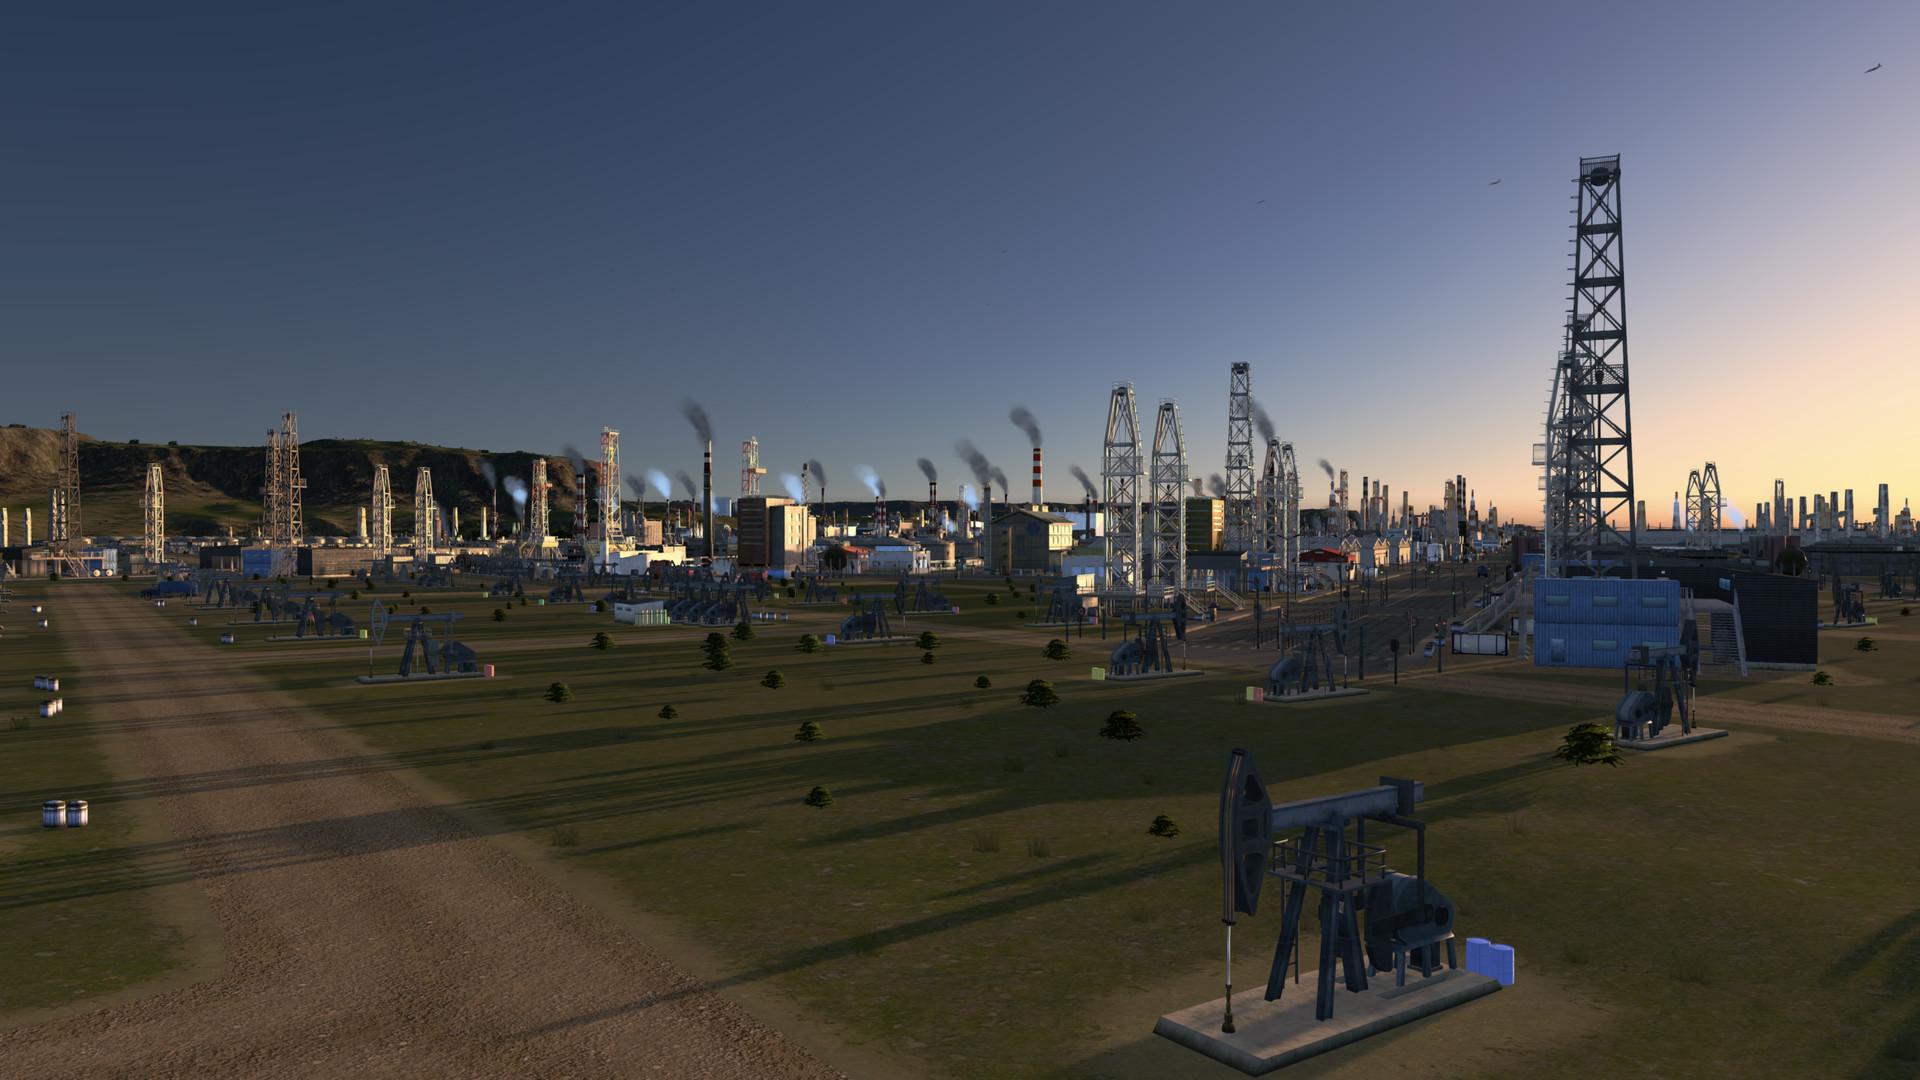 PC版《城市:天际线》10月24日推出工业扩展包